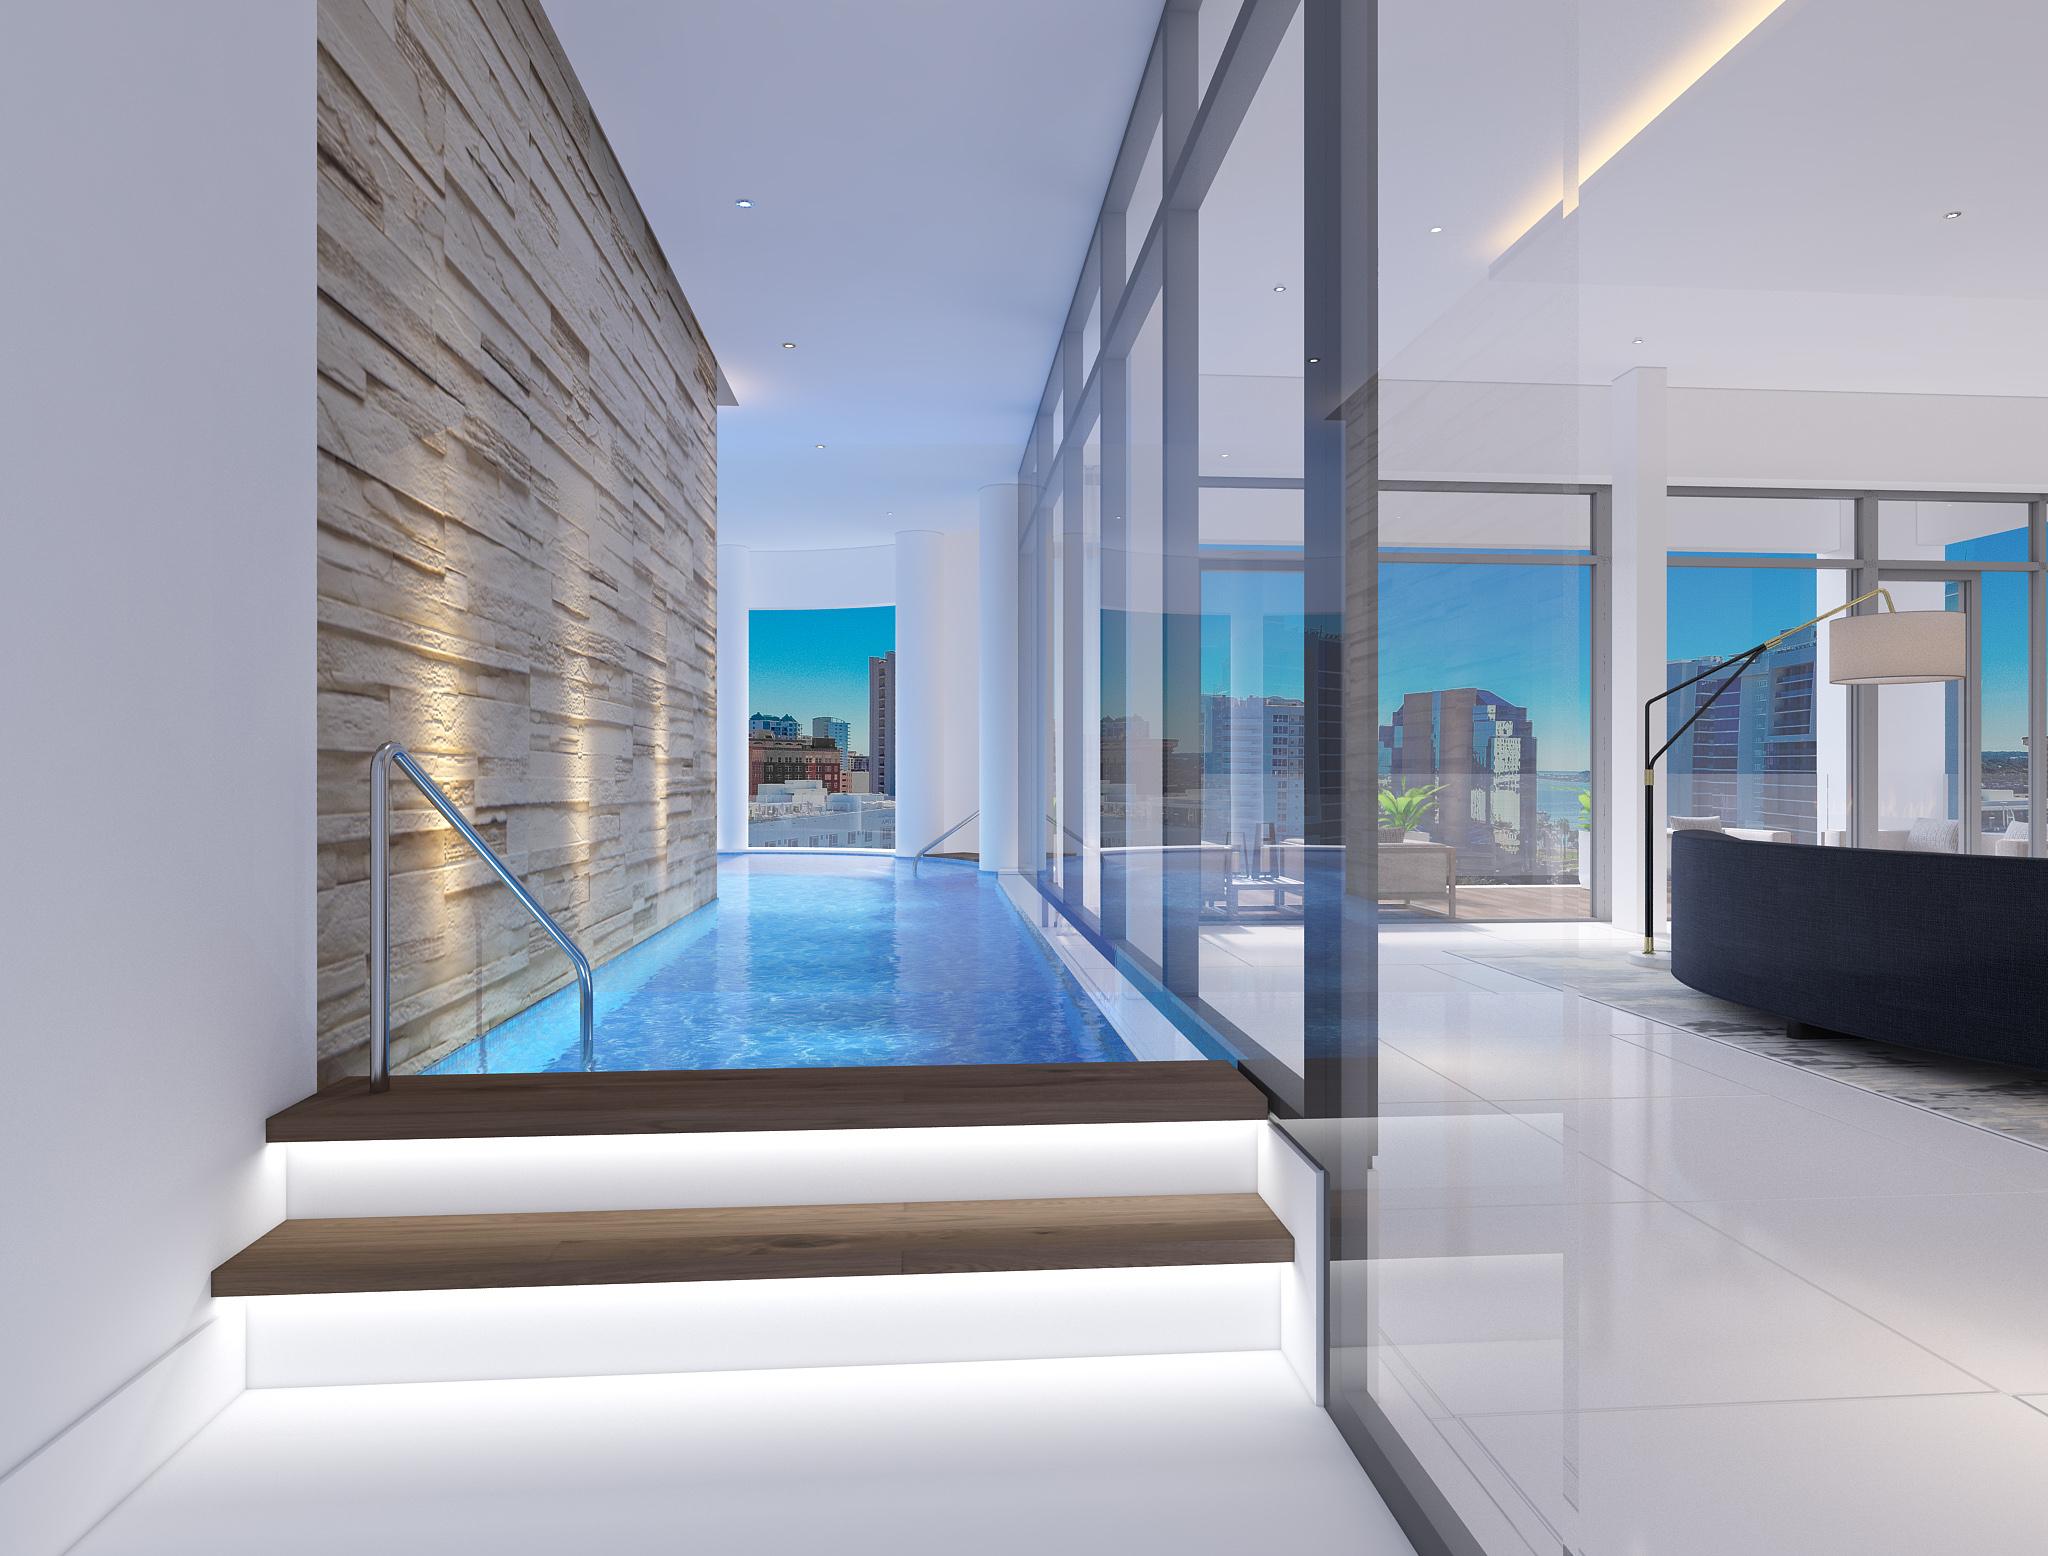 Beacon_pool